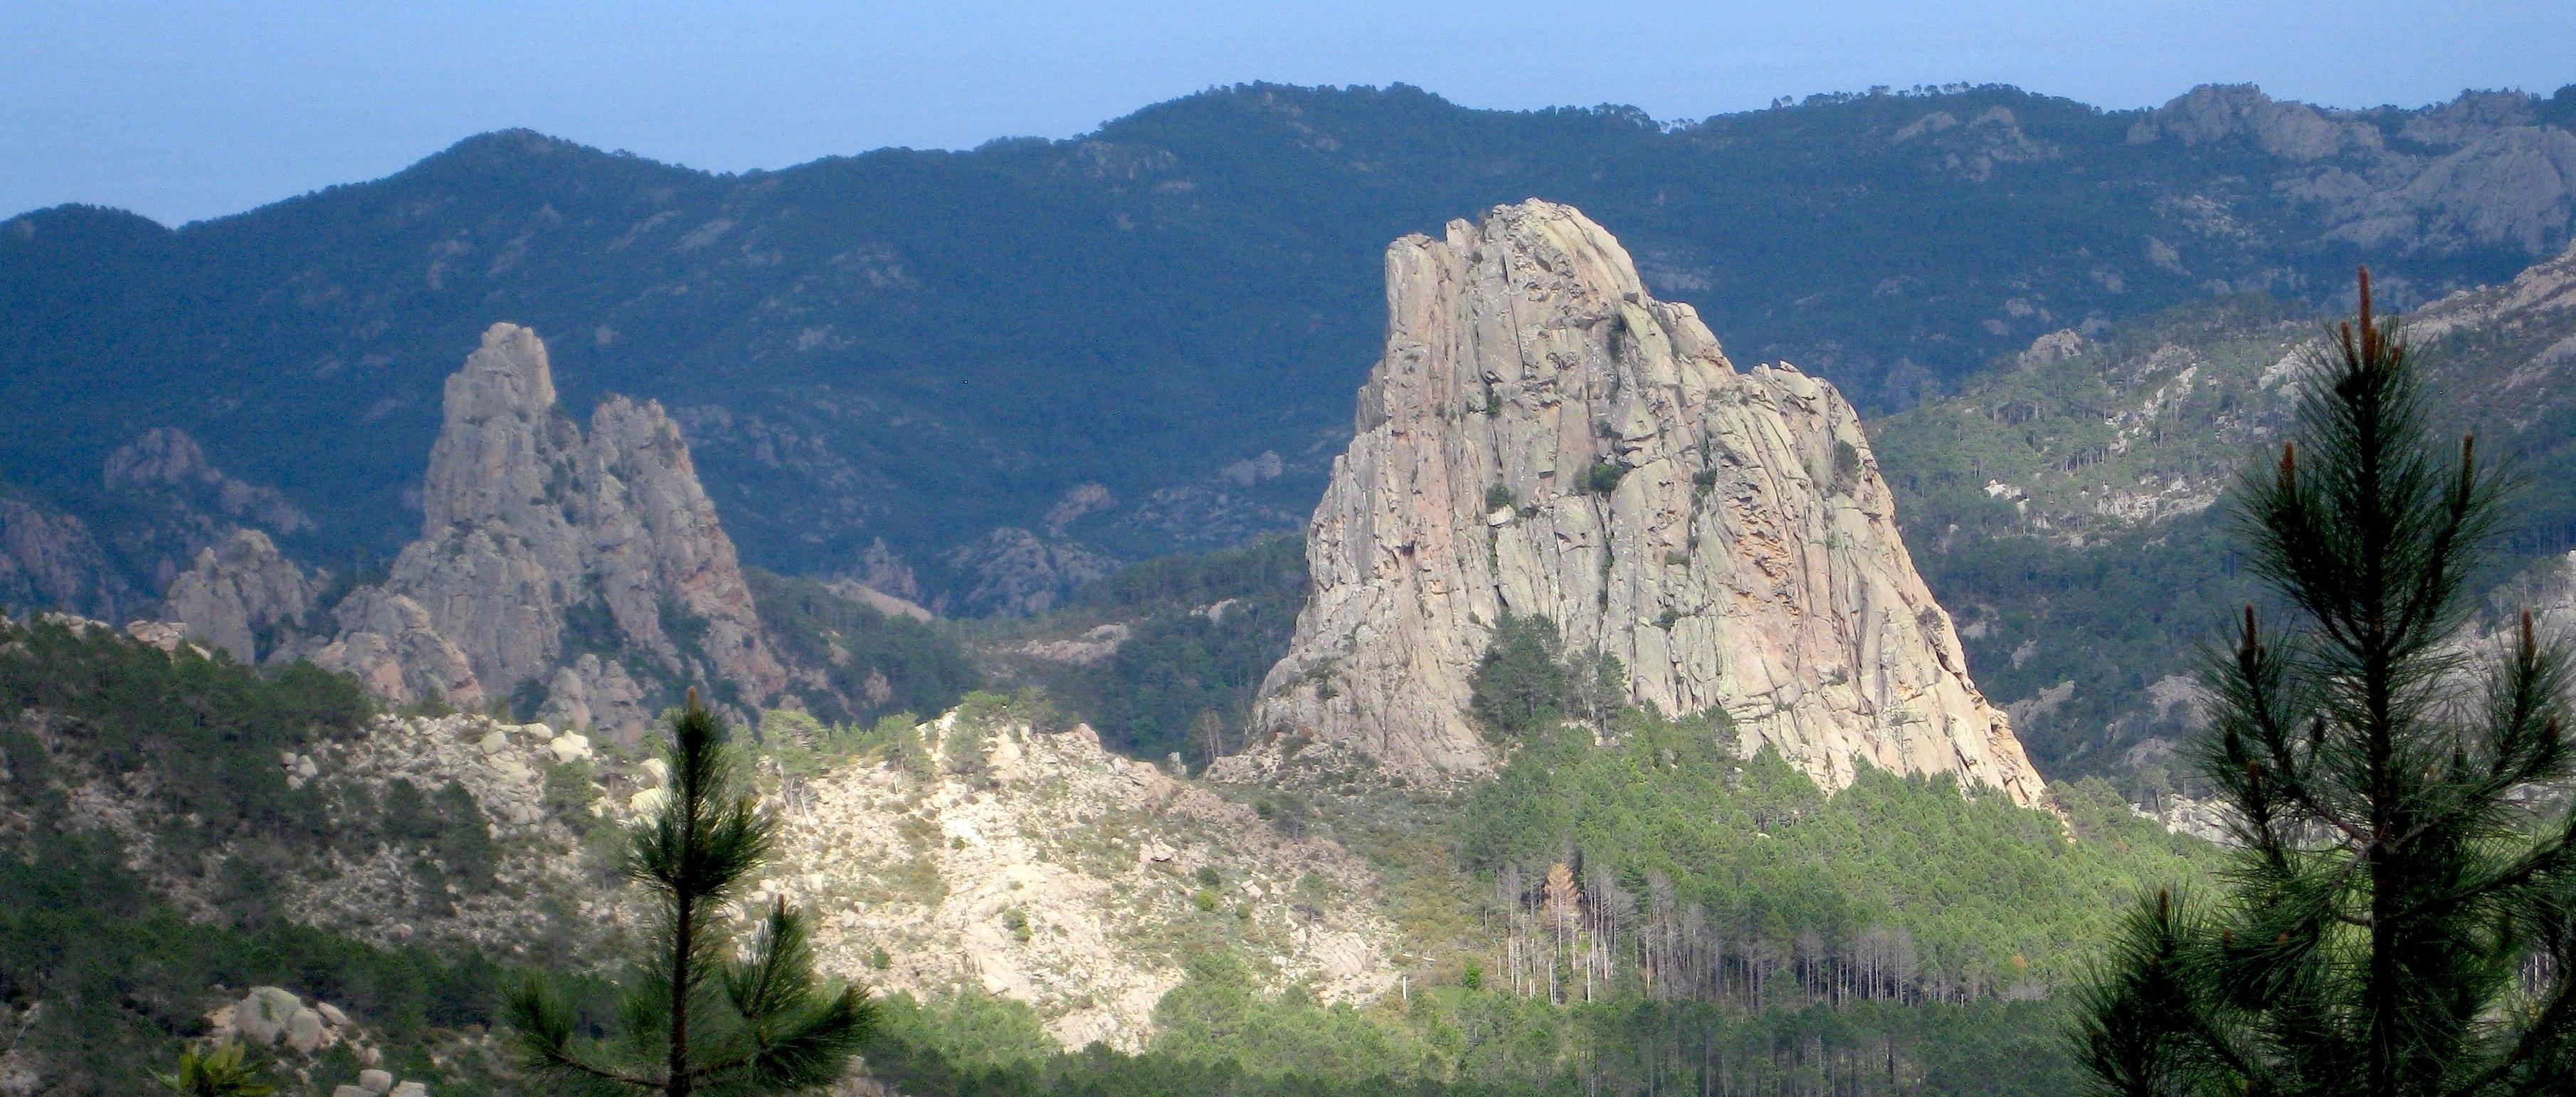 Au-dessus du refuge de Paliri - massif de Bavedda